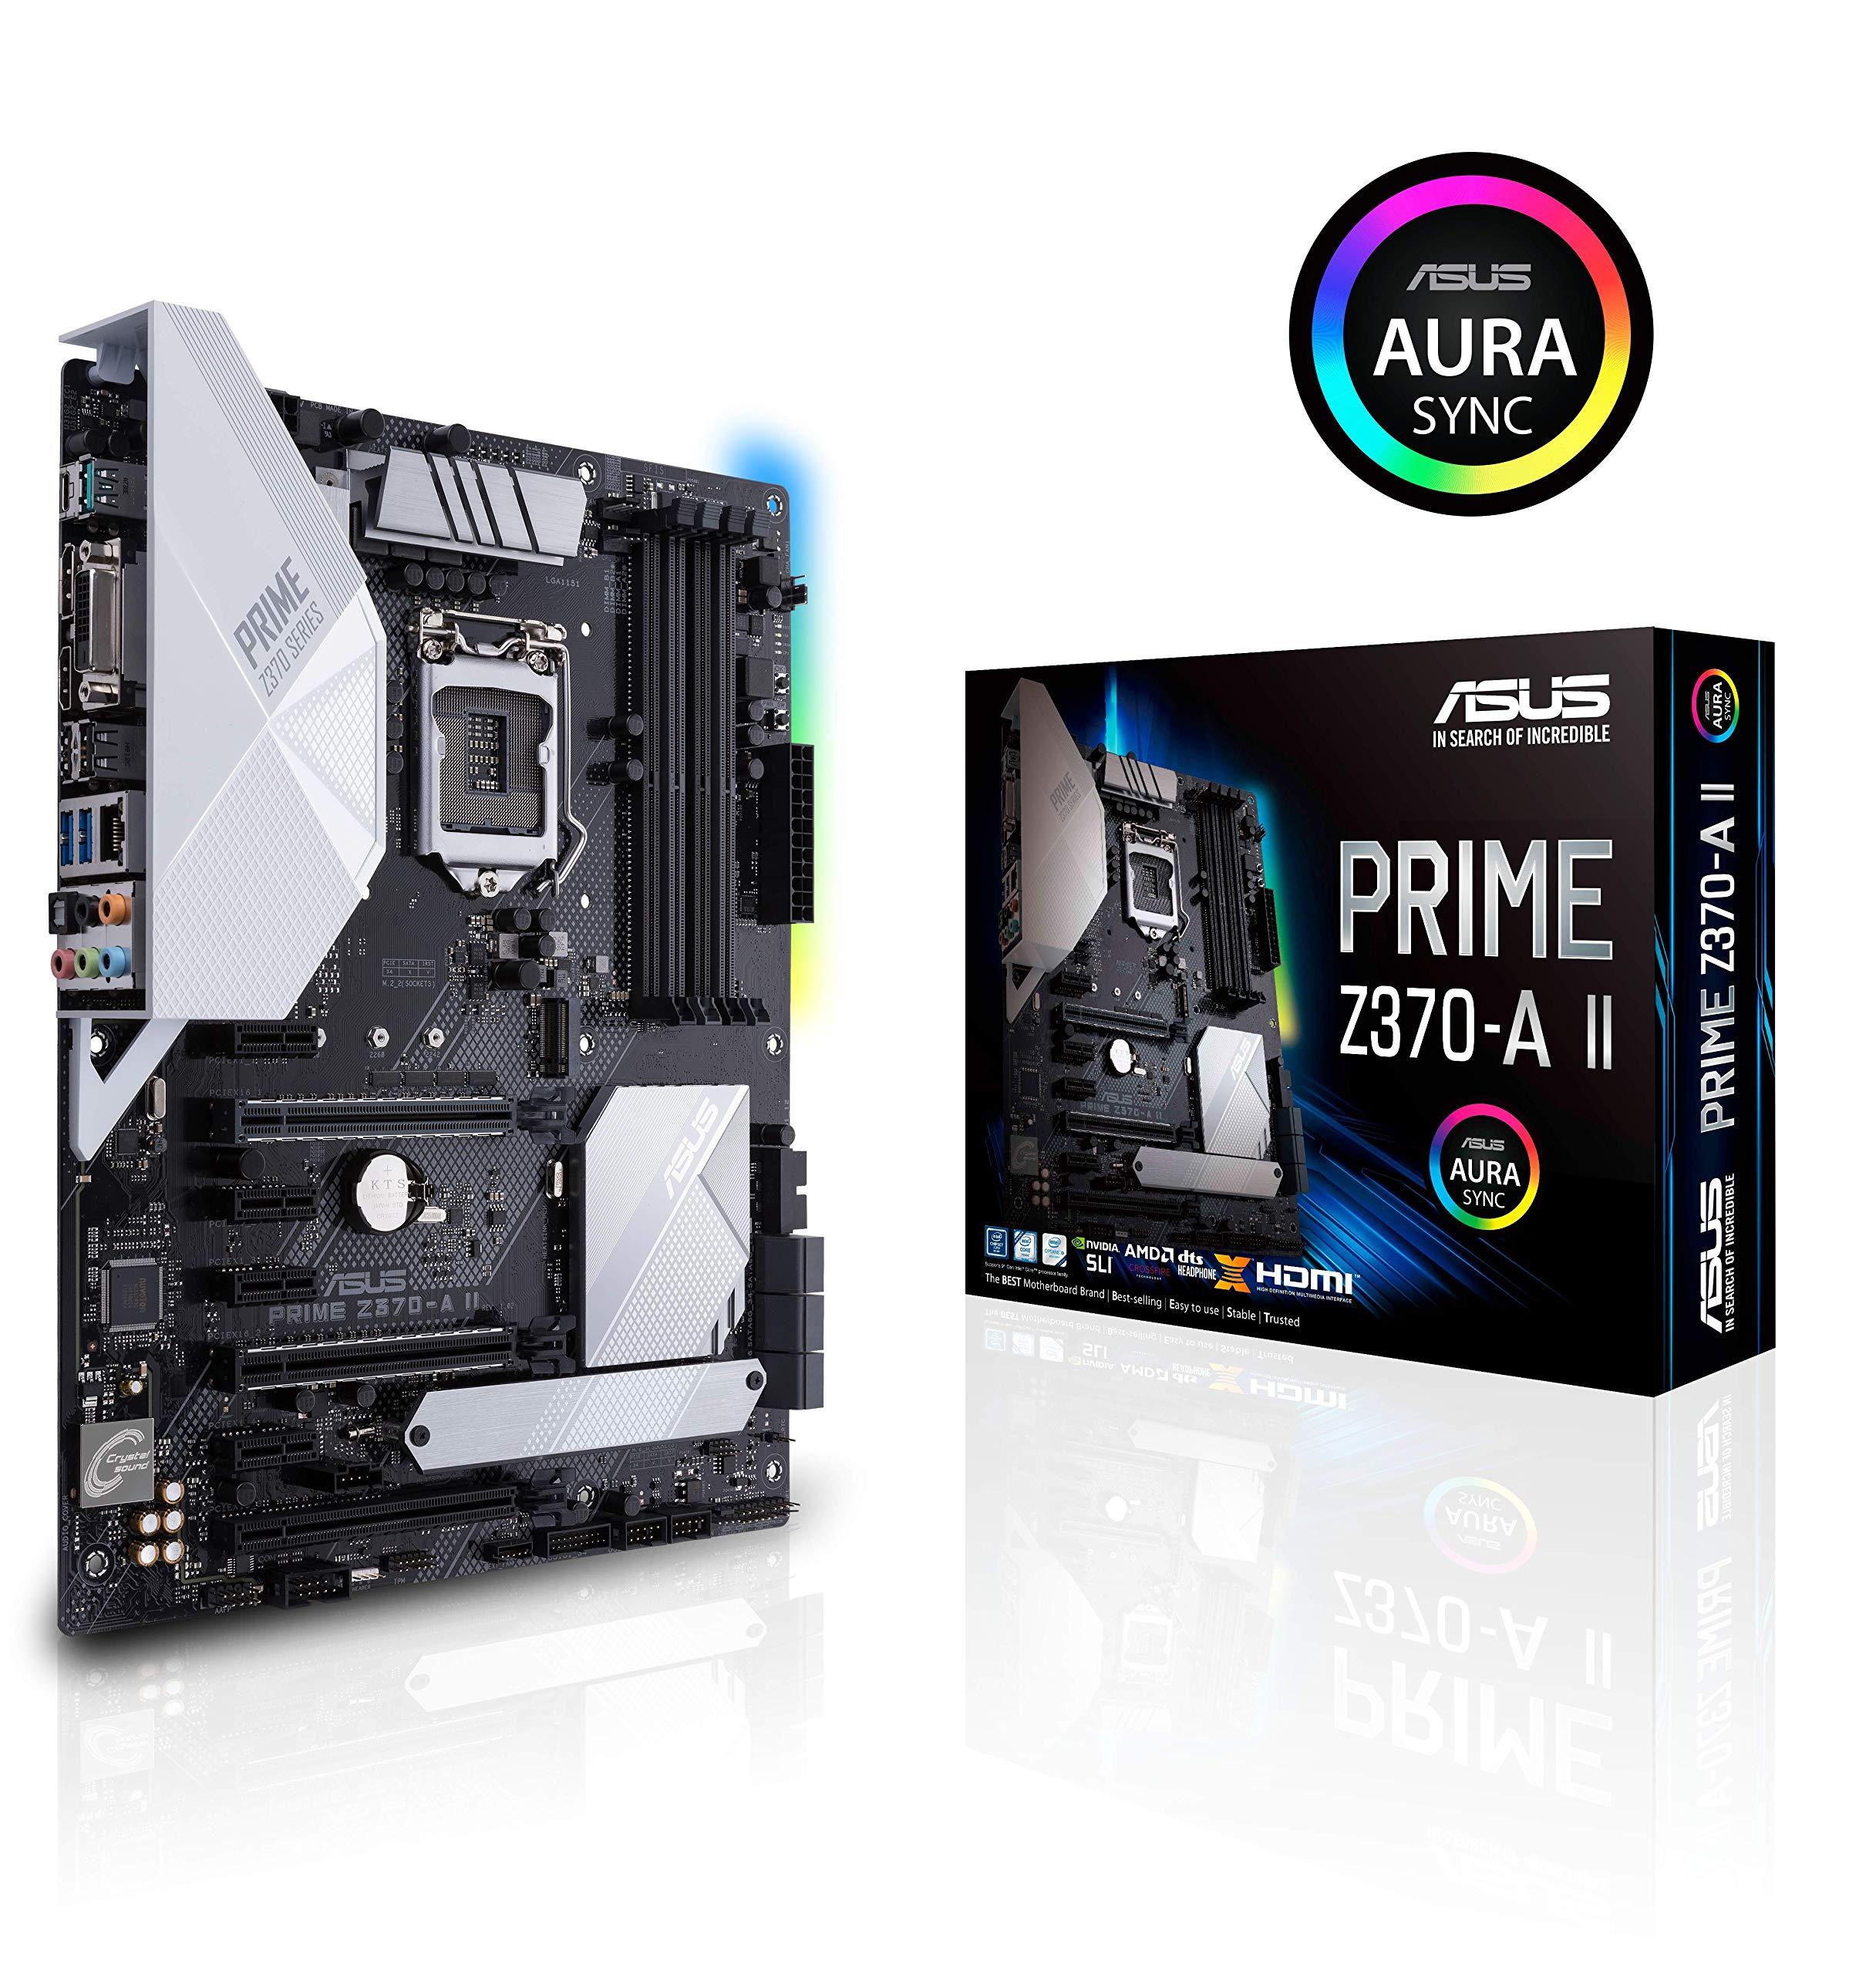 ASUS Prime Z370-A II (Intel 9th Gen) DDR4 DP HDMI DVI M.2 USB 3.1 Z370 II ATX Motherboard Gigabit LAN and USB 3.1 by ASUS